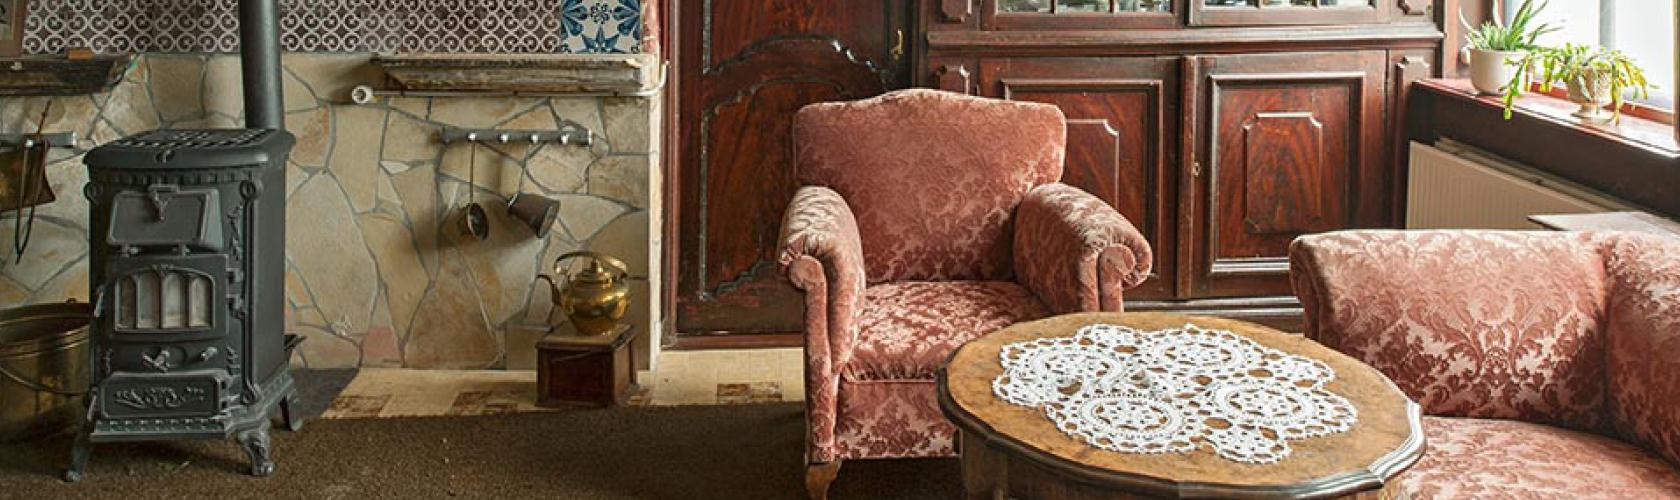 Omslagafbeelding | Historisch interieur